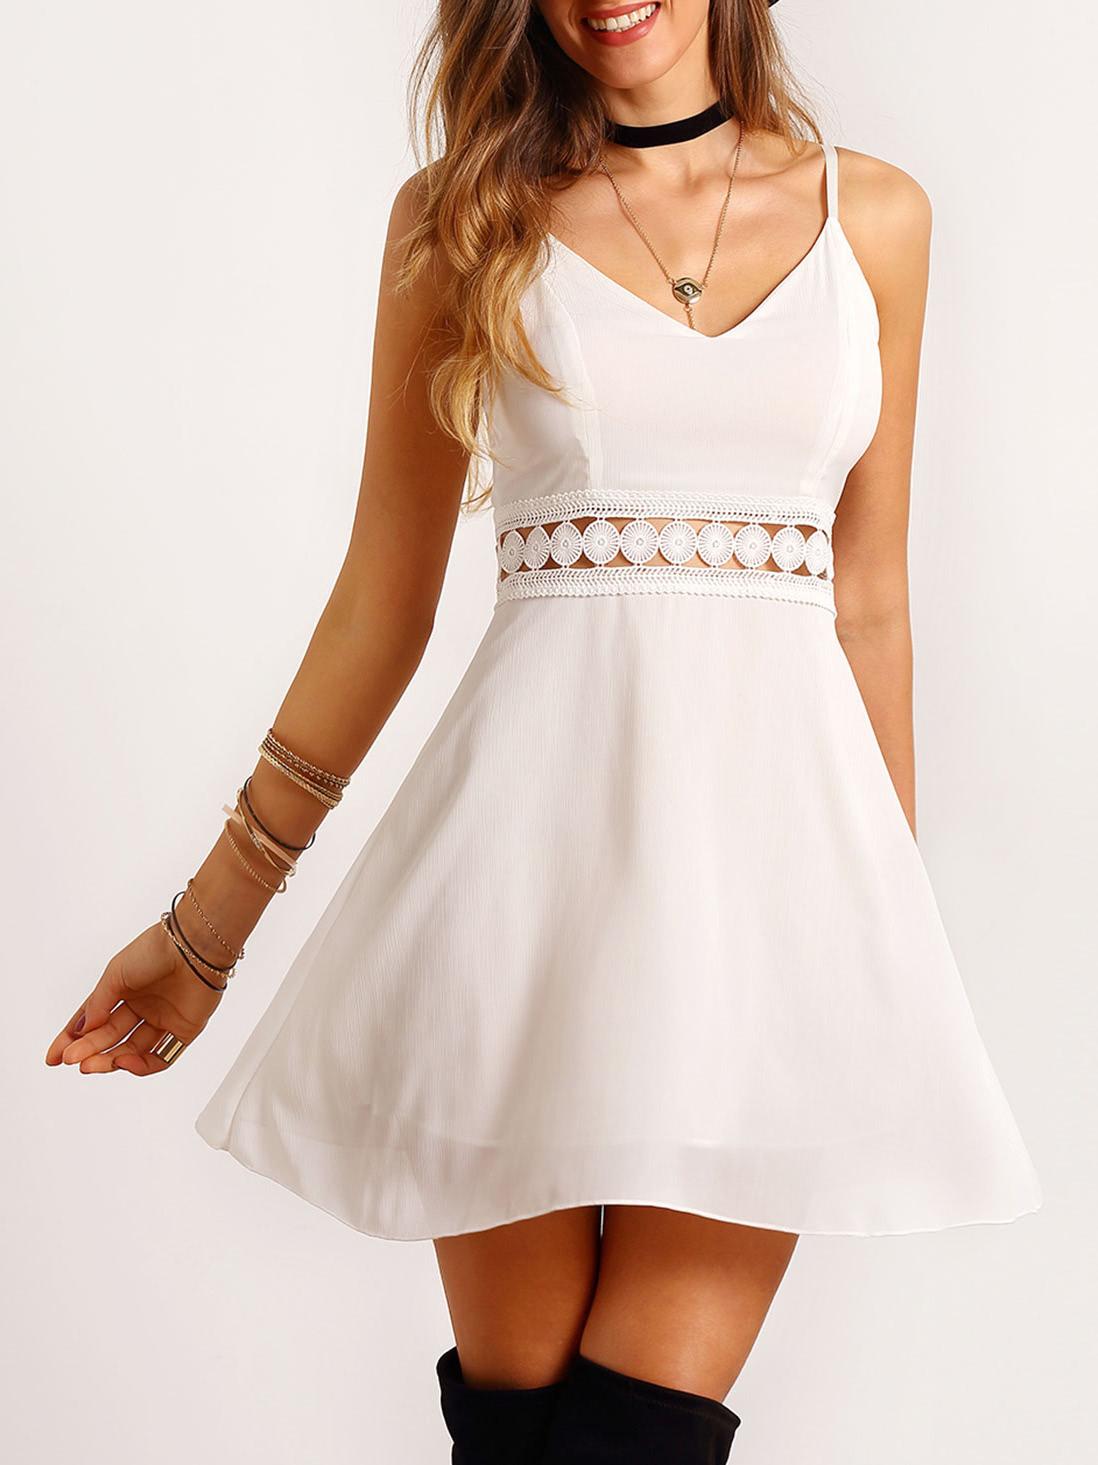 White Spaghetti Strap Lace Slim Dressfor Women Romwe